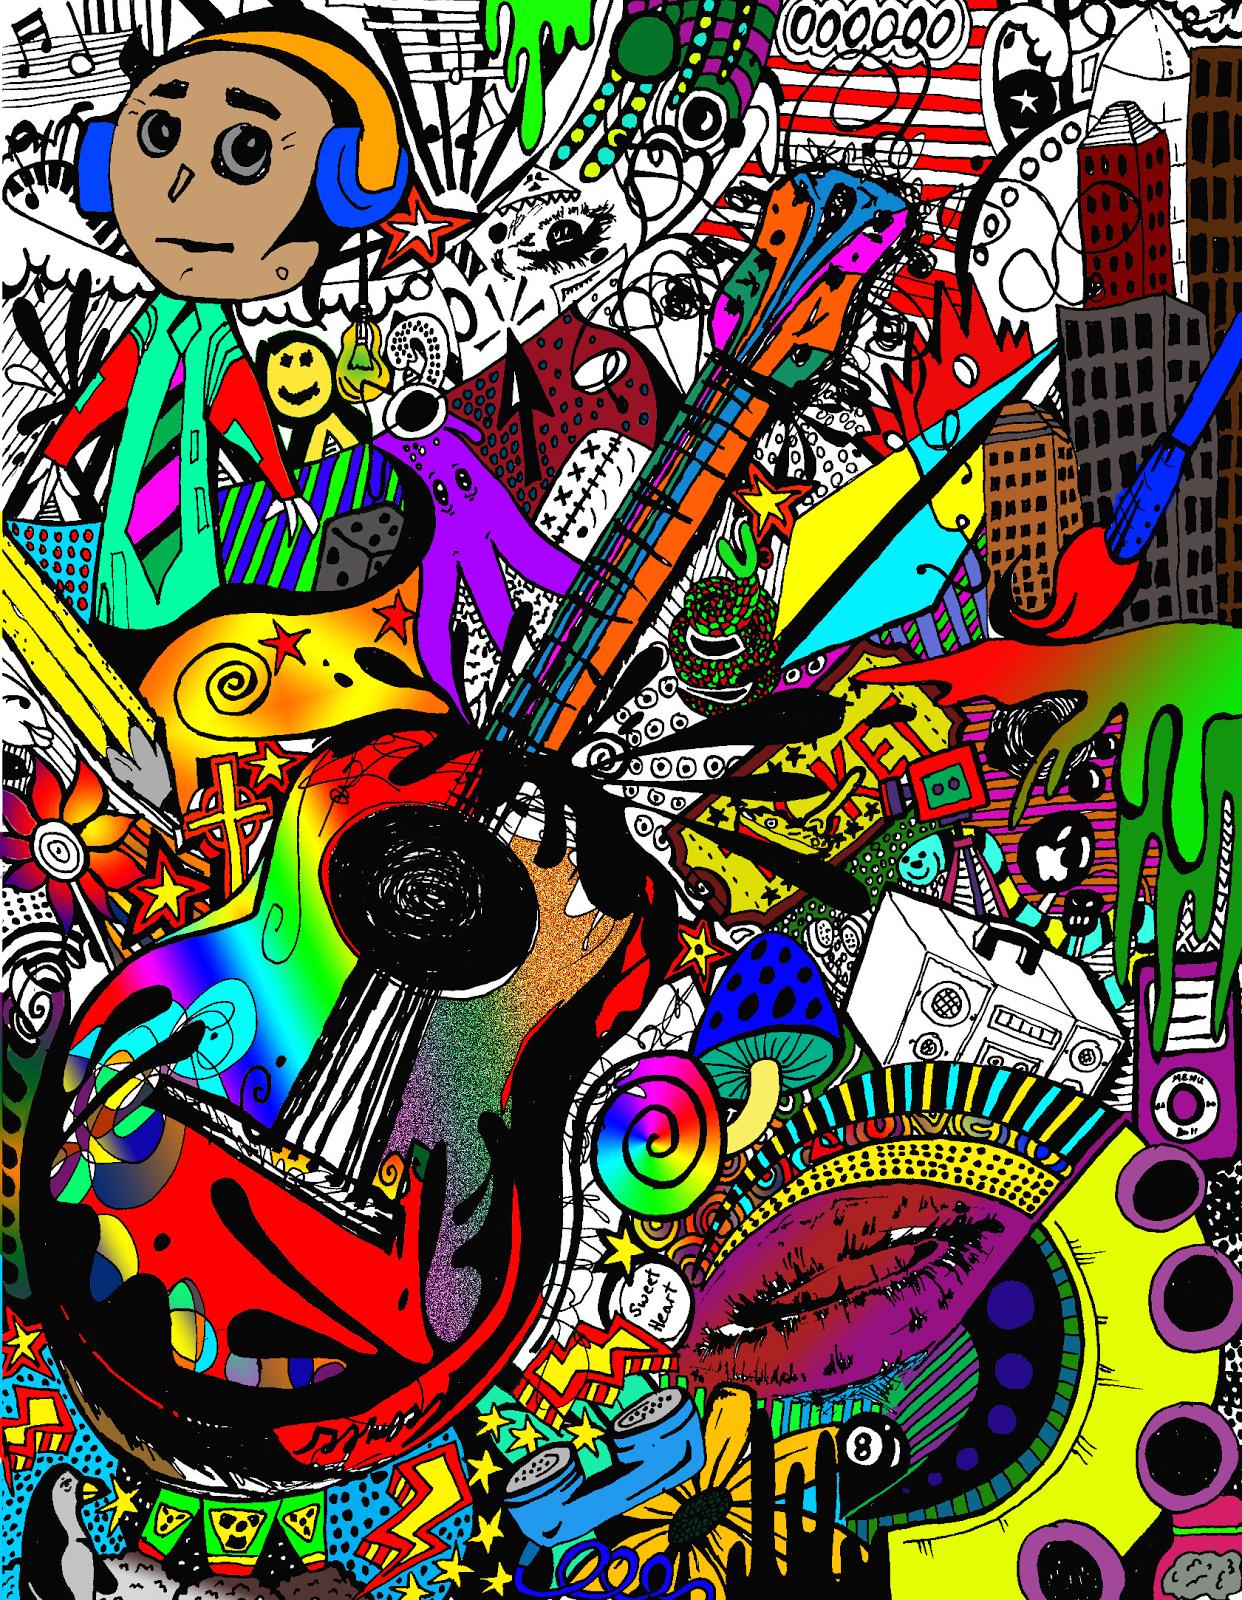 CAMERON'S GA 20 BLOG!: Graphic arts doodle final